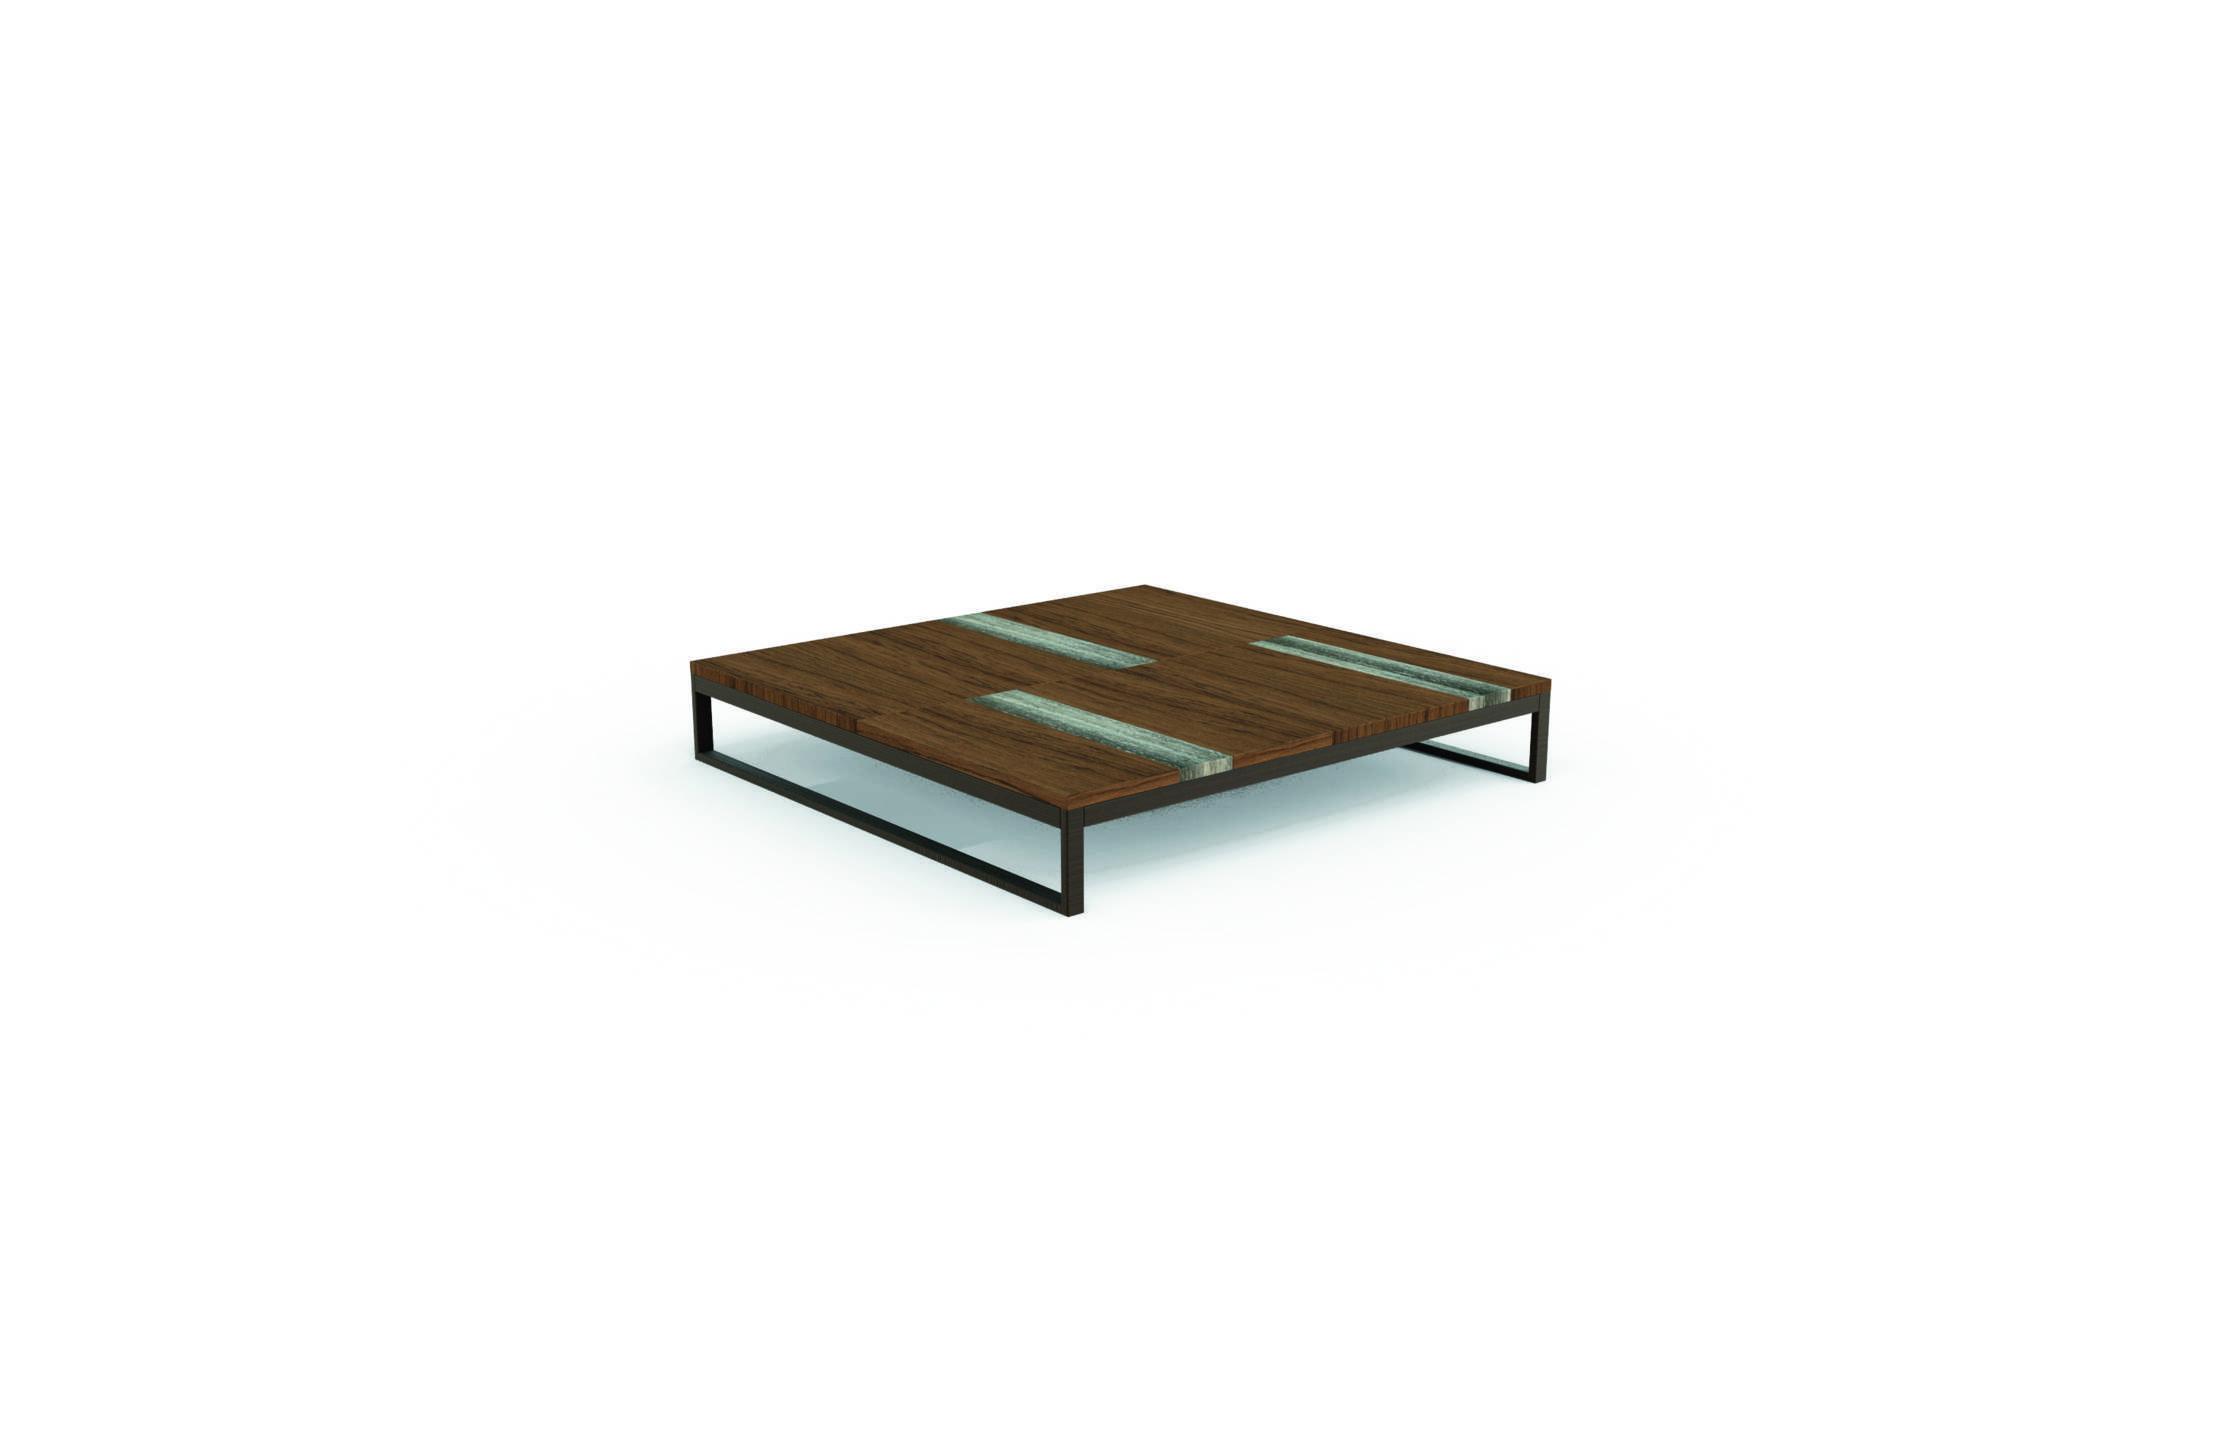 Vivereverde cover tavolo caffe 100x100 casildacollection set divani da giardino set divani - Divani da giardino usati ...